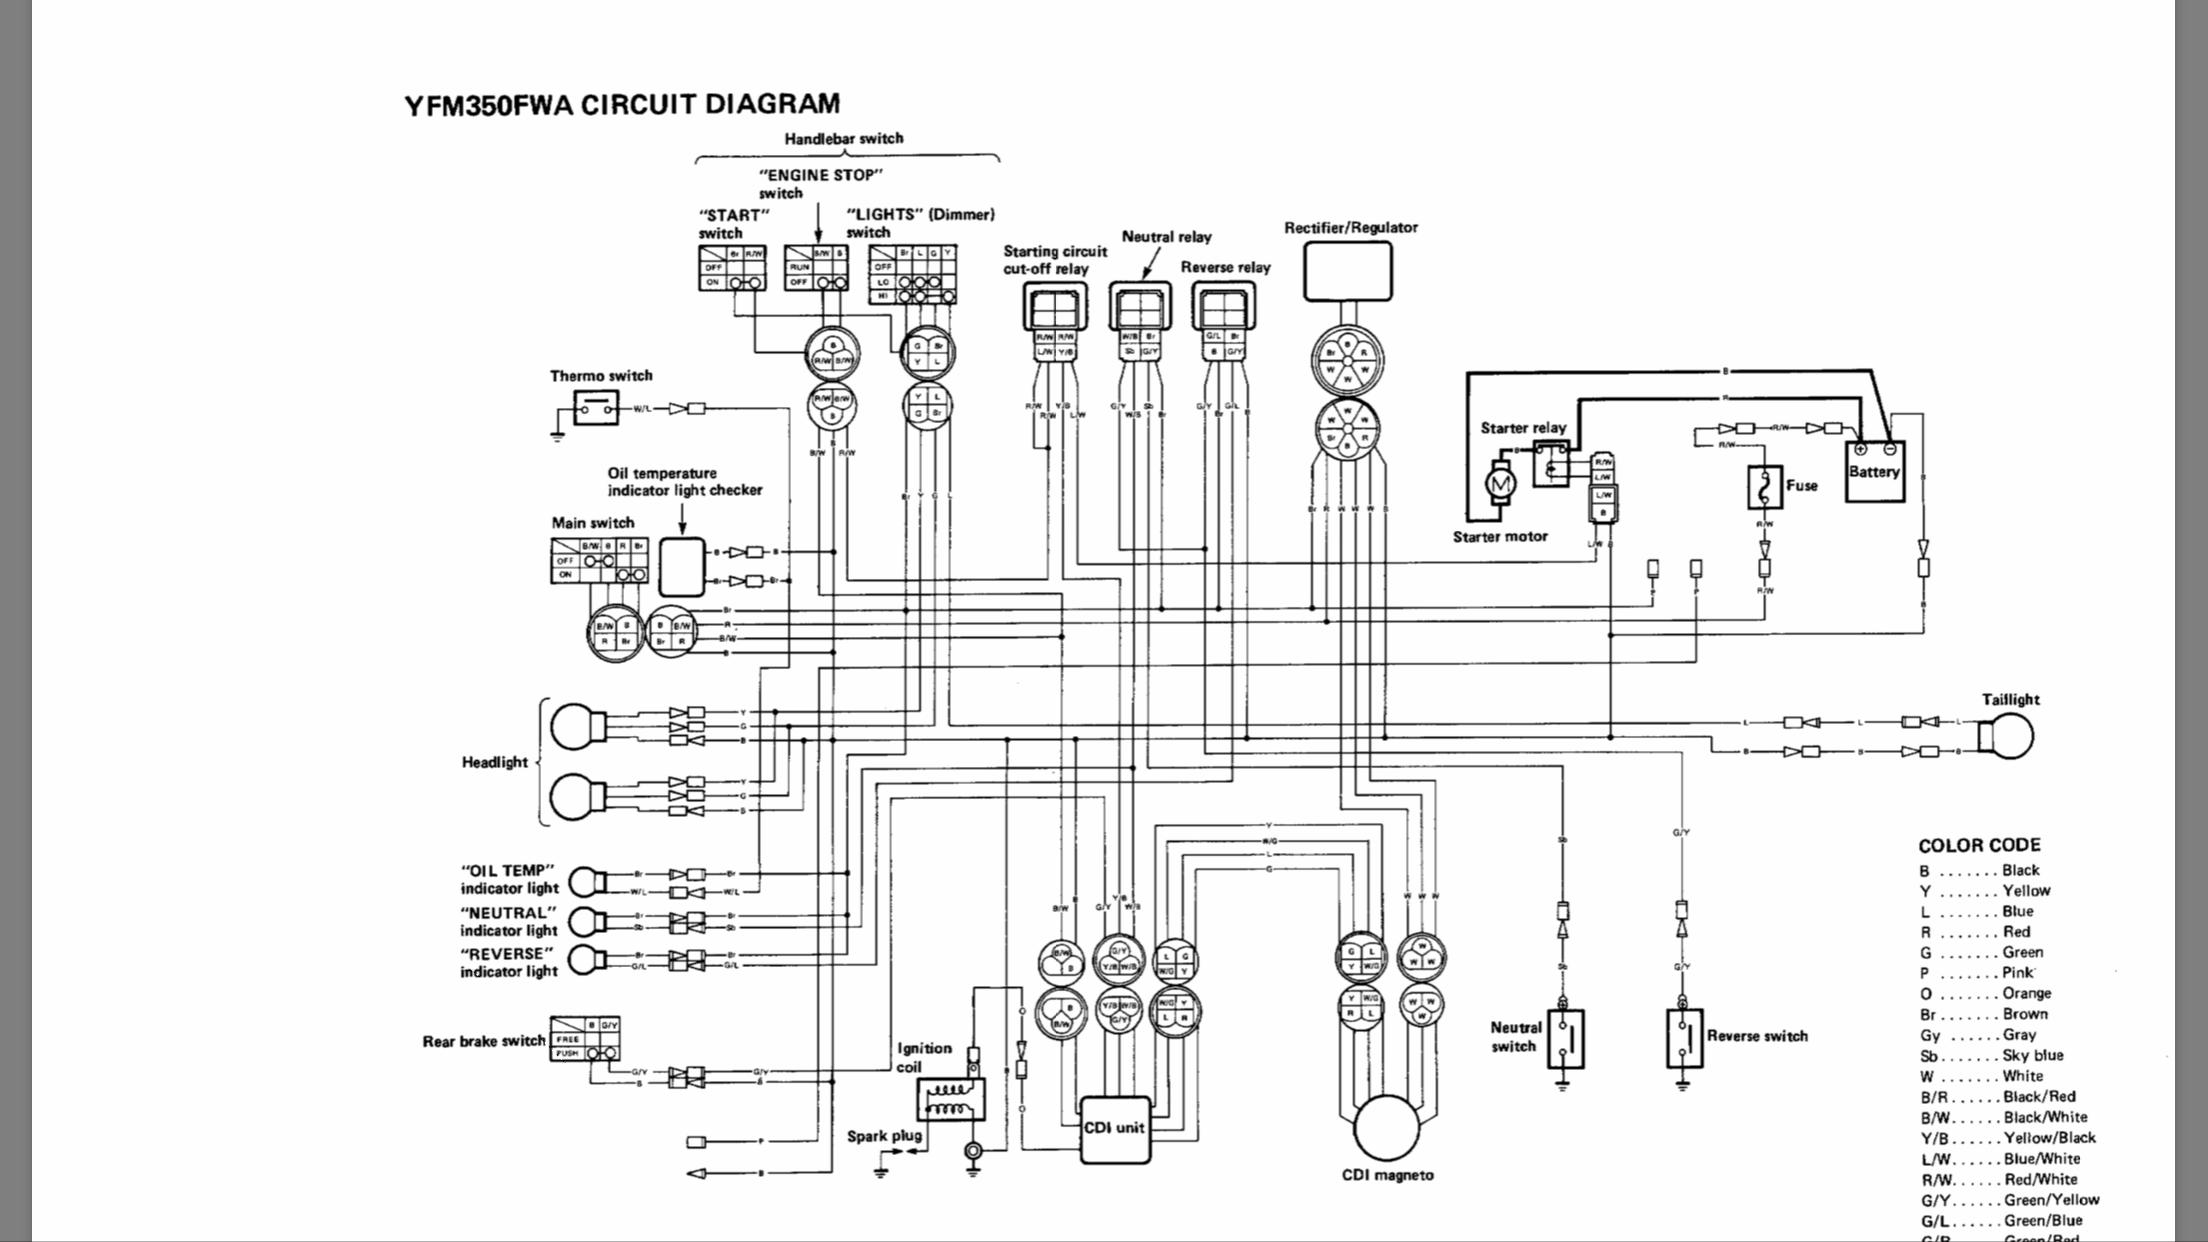 [DIAGRAM] Yamaha 350 Big Bear 4x4 Project Wiring Diagram